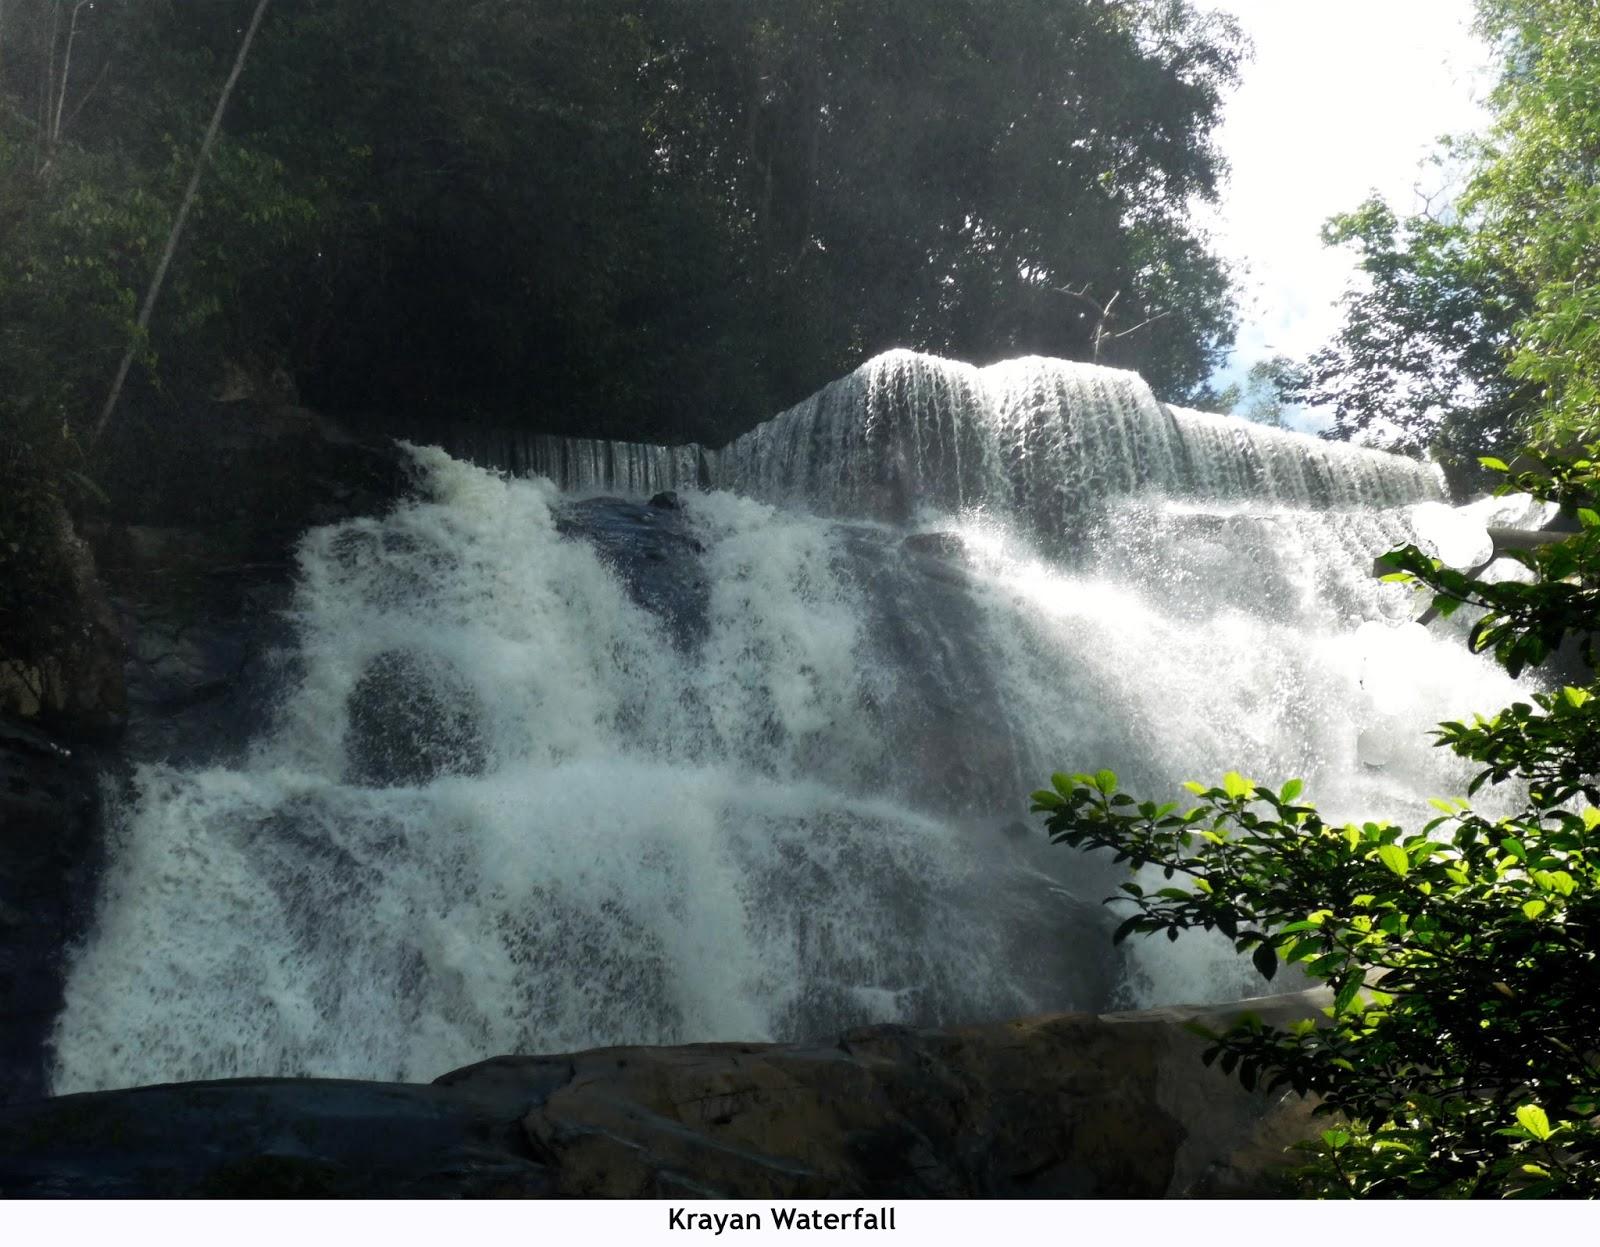 Beauty Landscape Indonesia Beautiful Scenary North Krayan Waterfall Paremayo Located